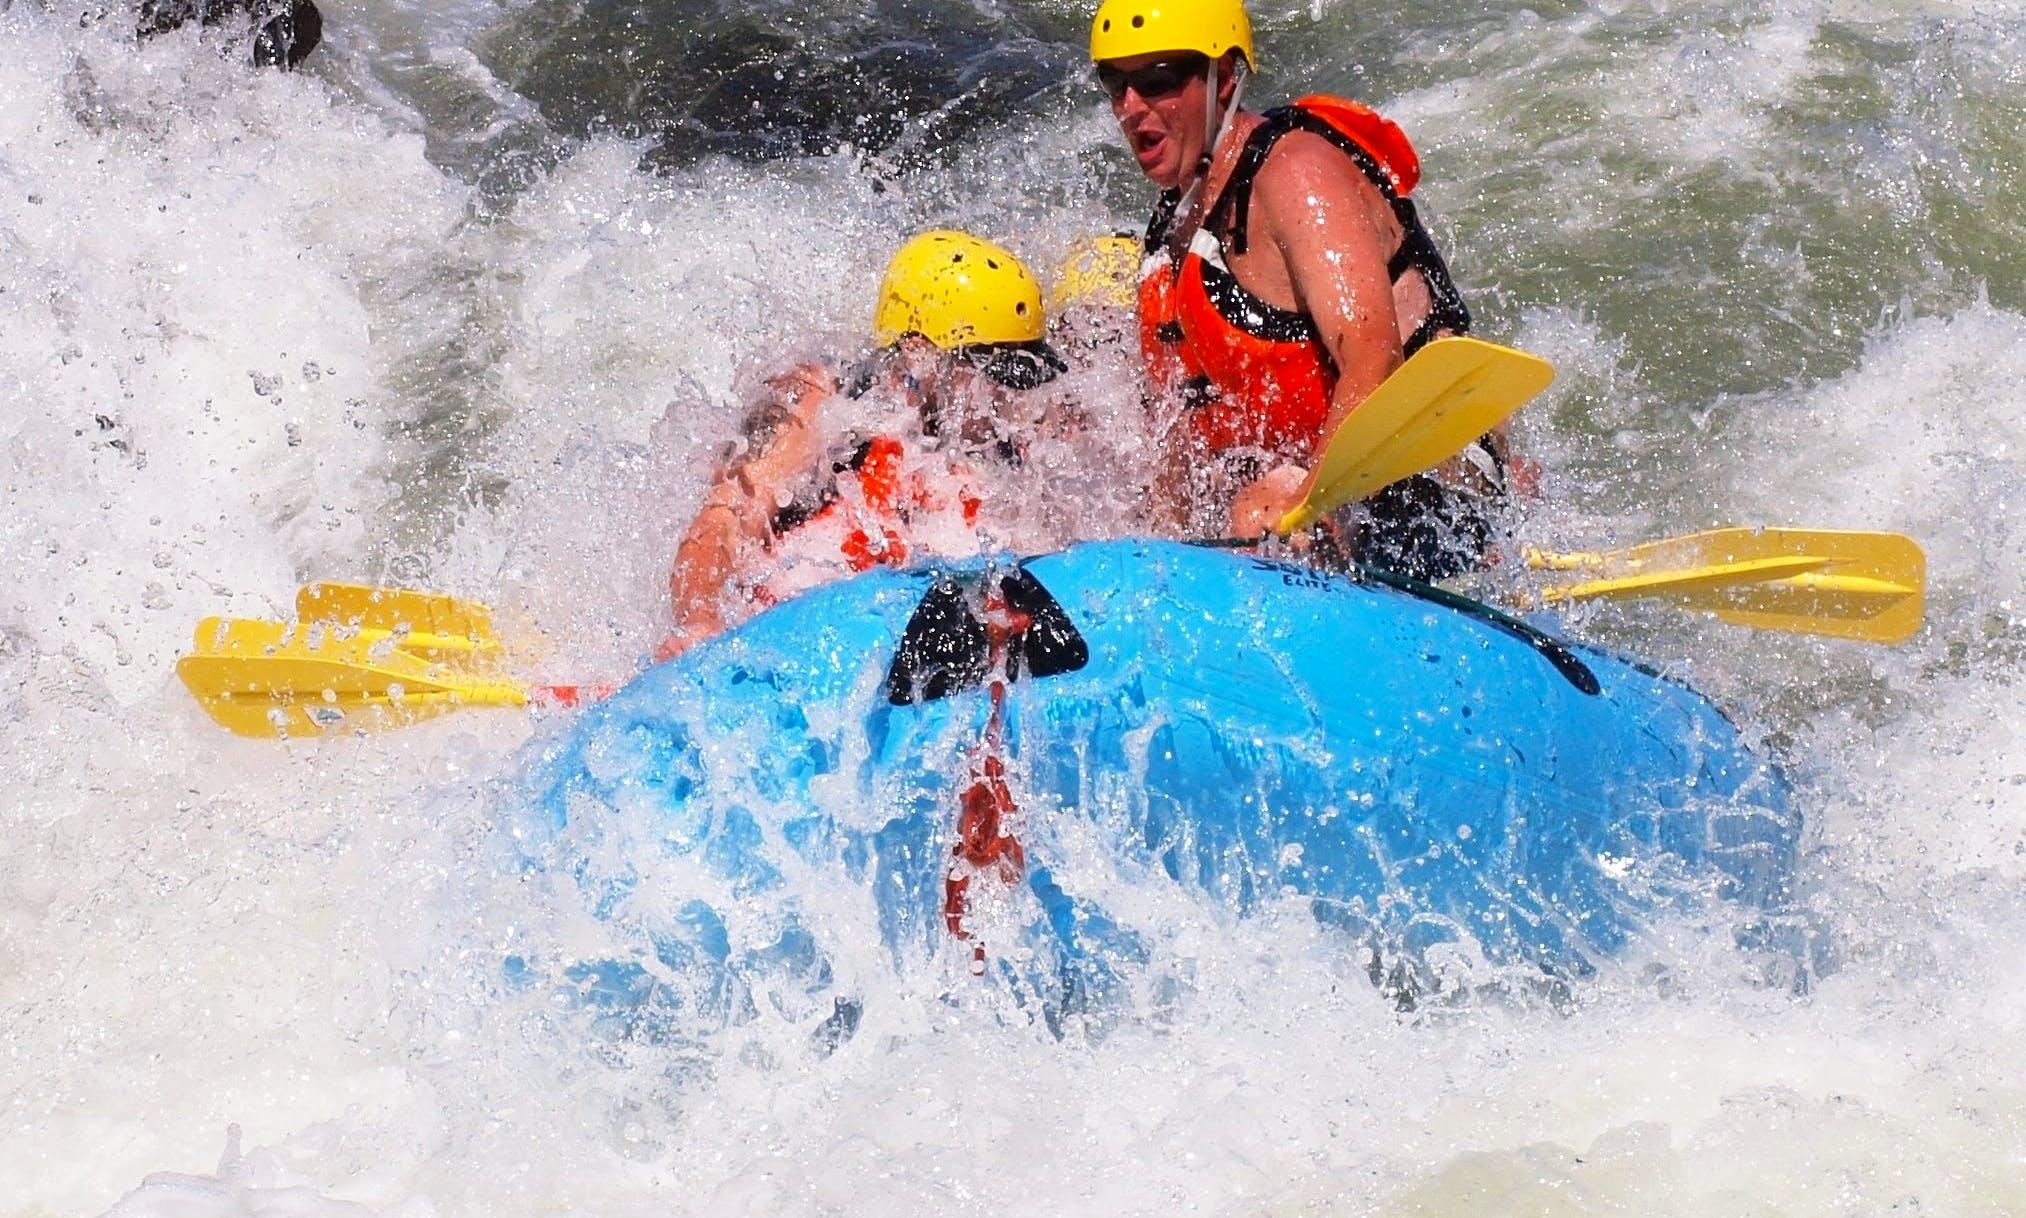 Rafting Trips in Waitomo, New Zealand